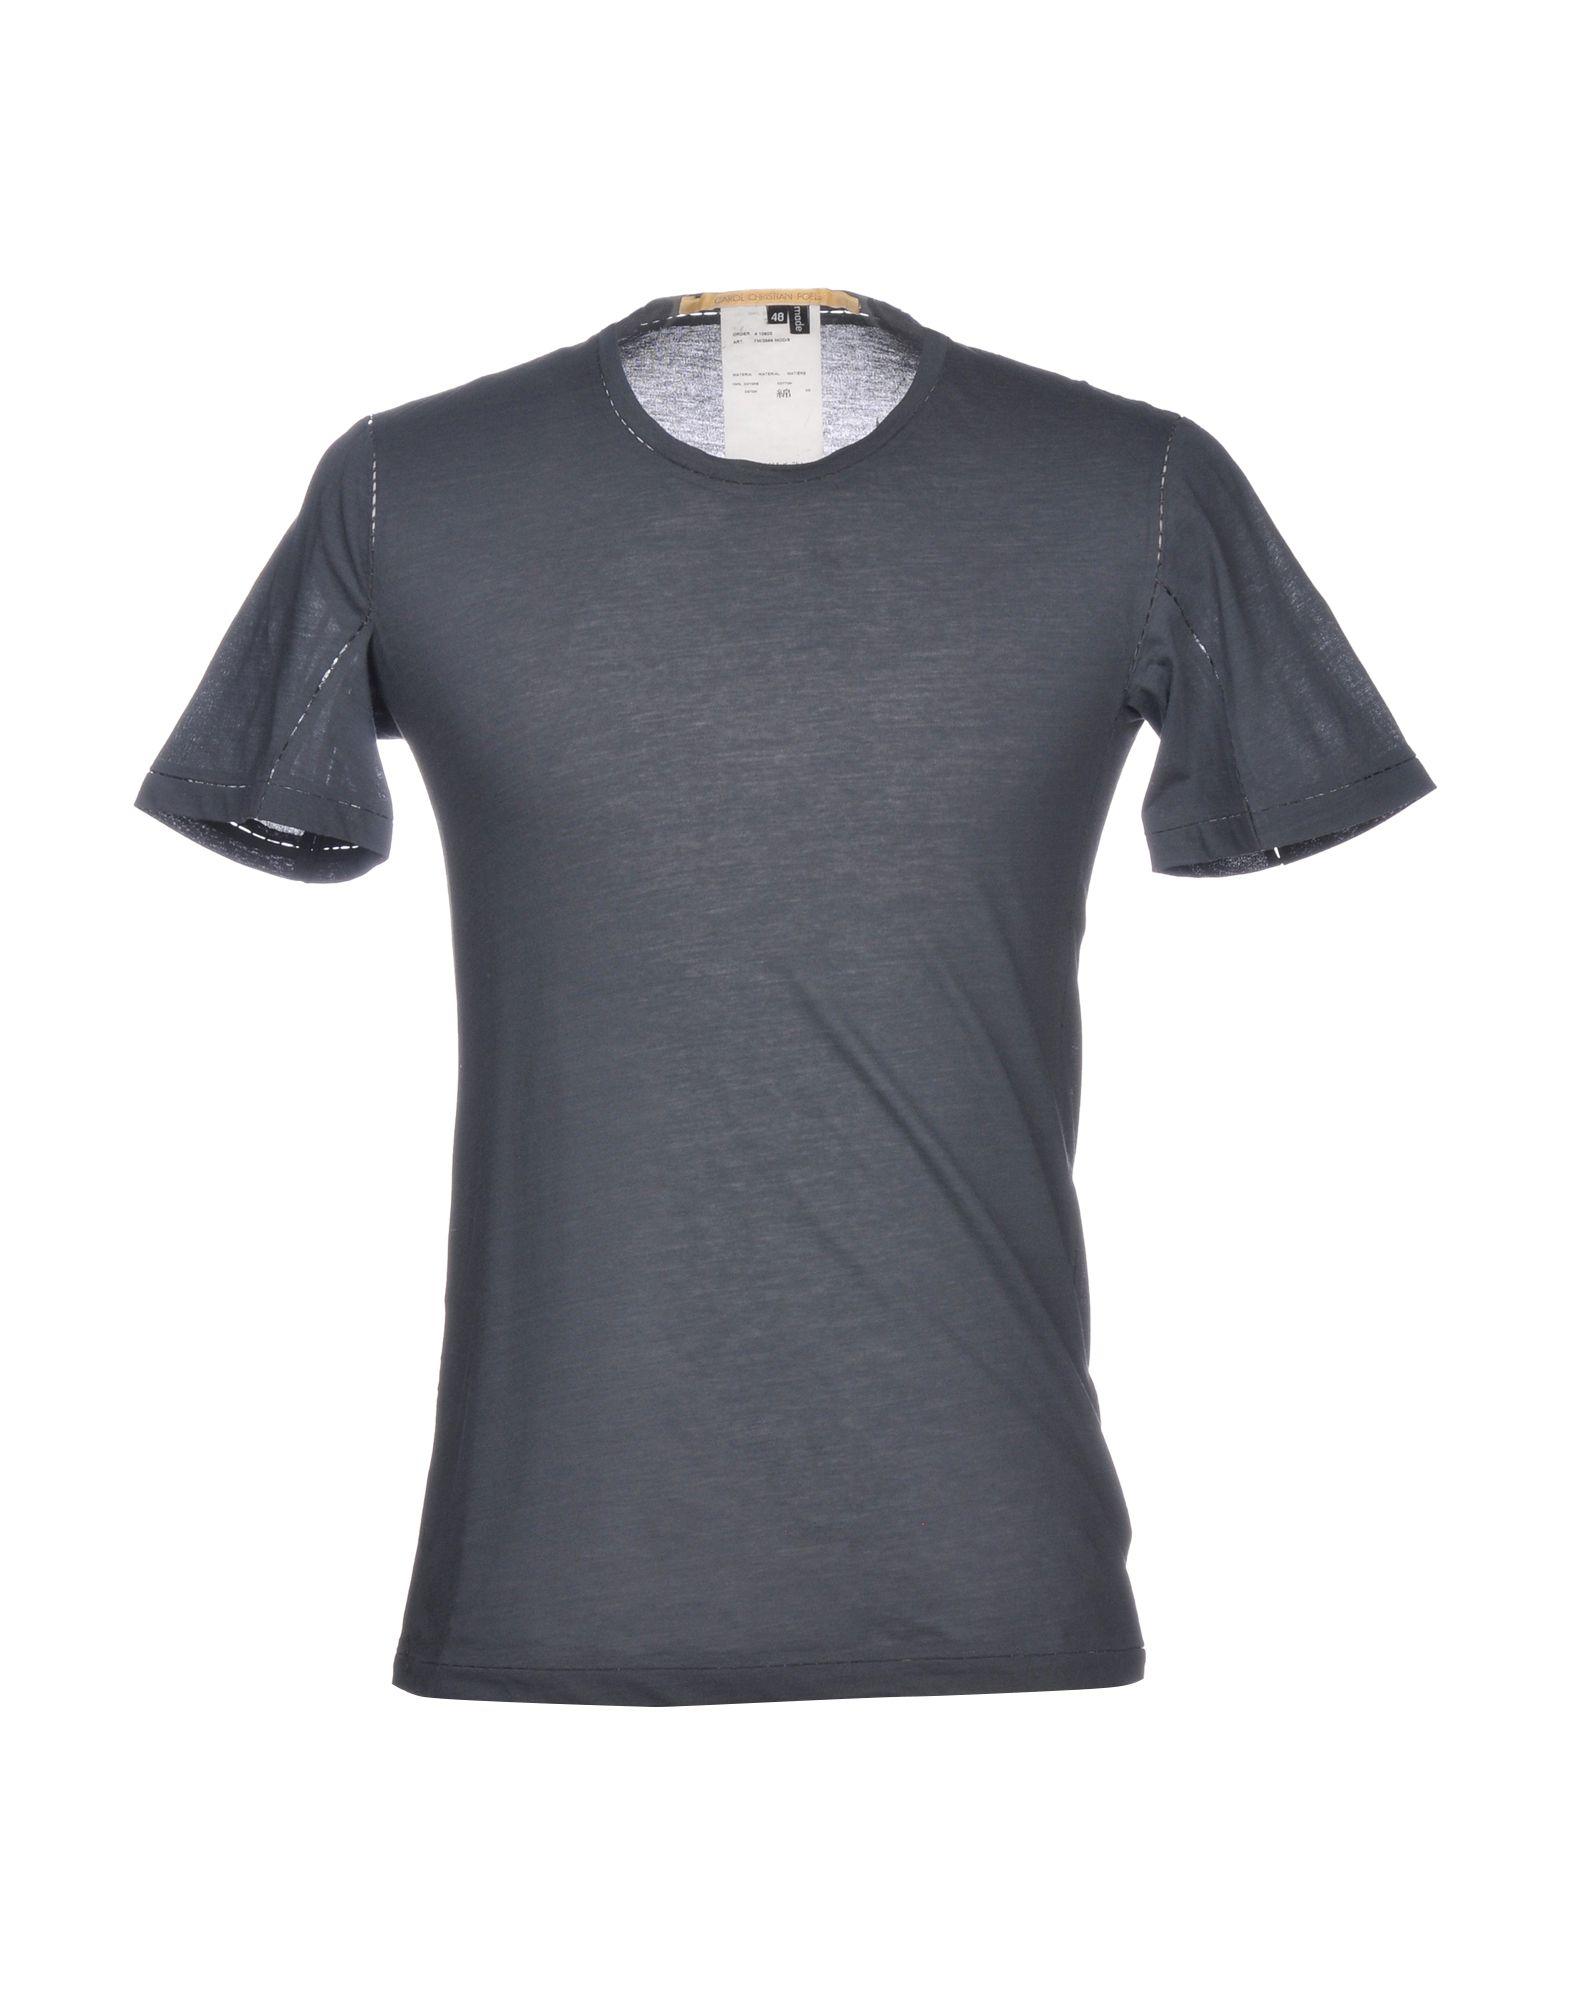 CAROL CHRISTIAN POELL Футболка футболка mango футболка carol